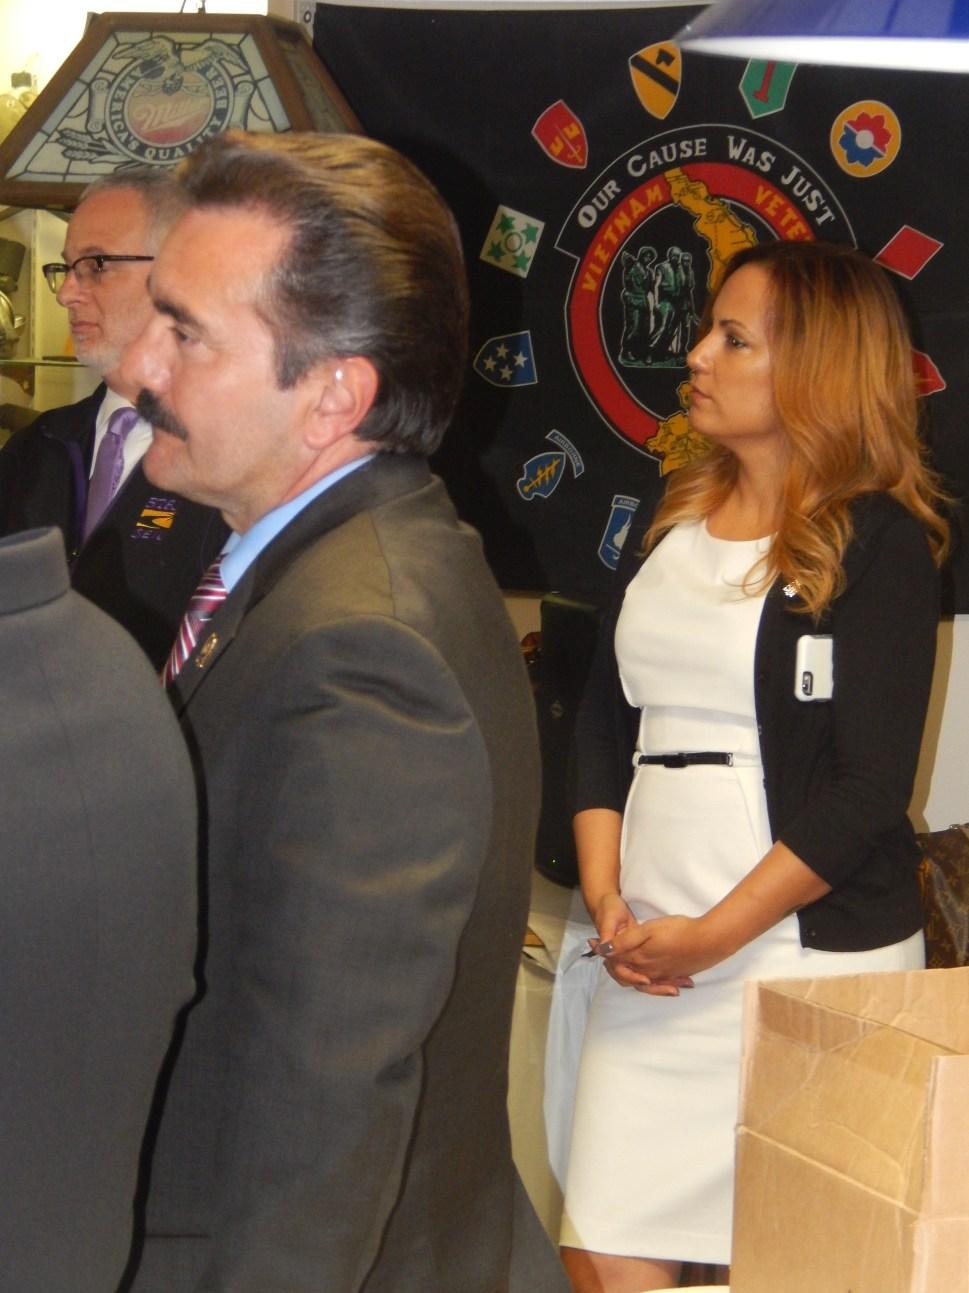 Speaker Vincent Prieto (D-32), left, and SEIU 32BJ's Political Director Julie Diaz.